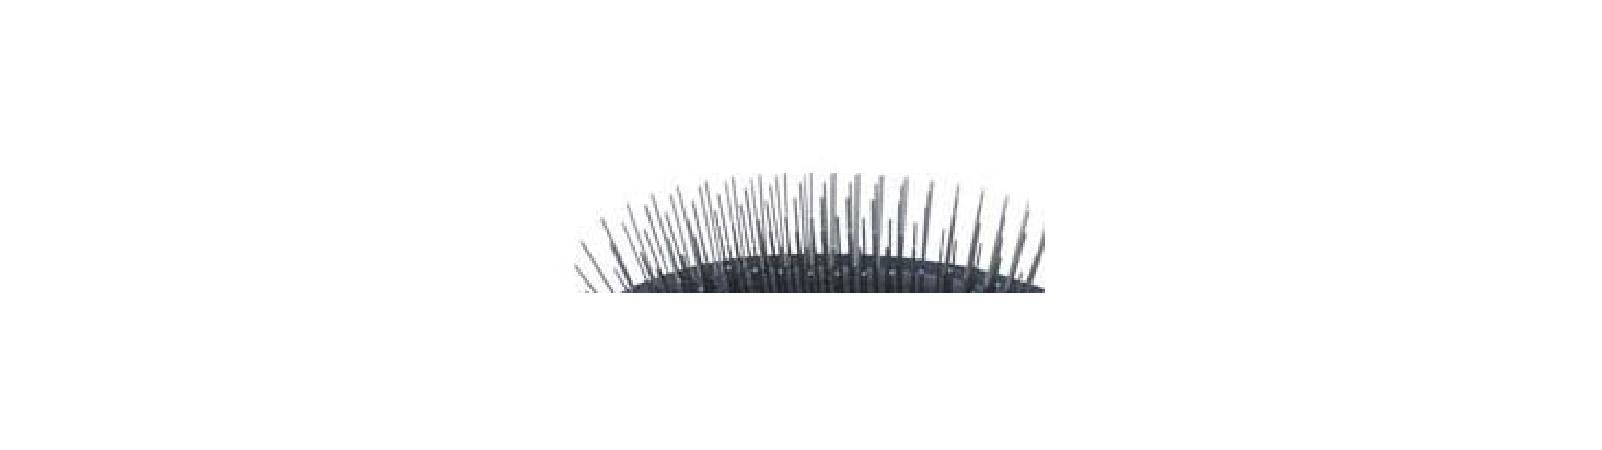 SHOW TECH Pin brush Large щетка массажная с пластиковой ручкой, 24STE016